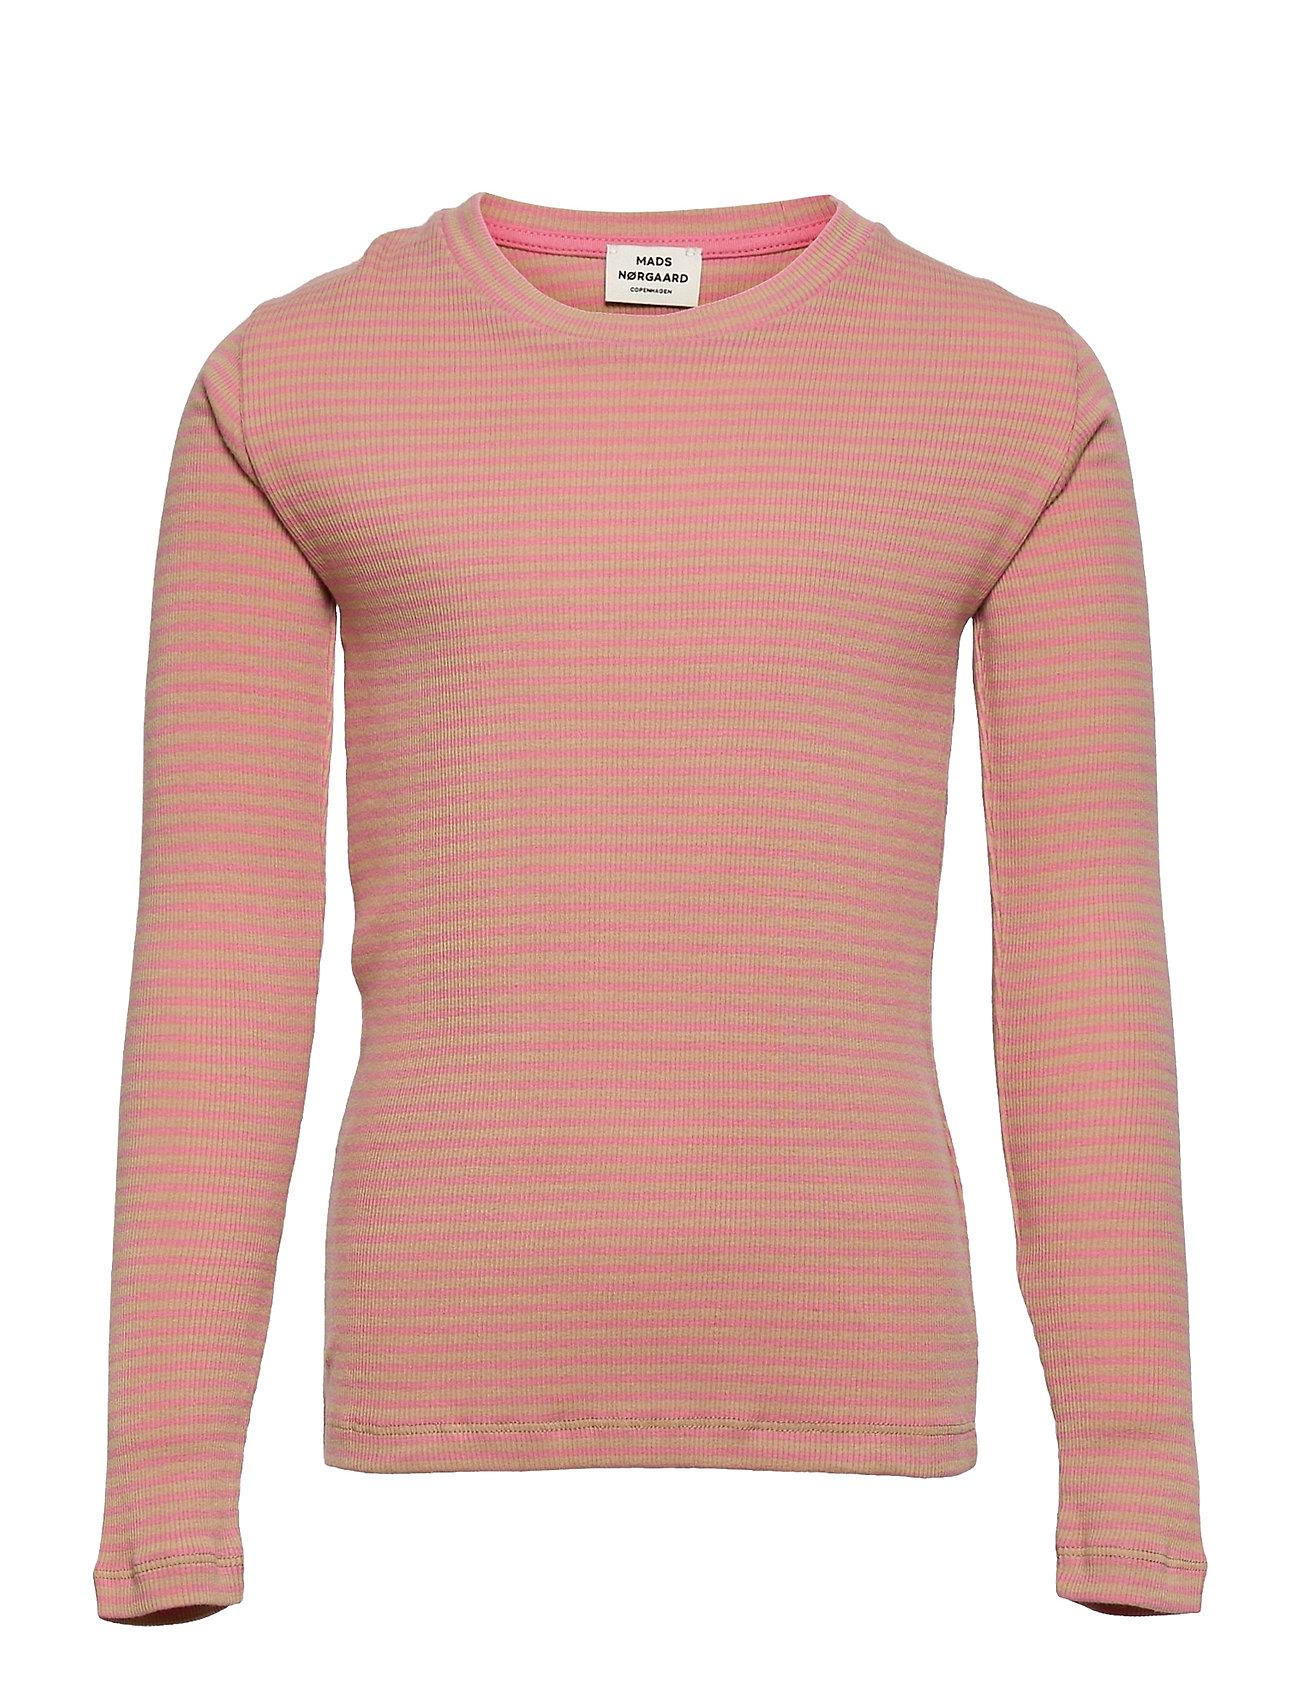 2x2 Cotton Stripe Talino Langærmet T-shirt Multi/mønstret Mads Nørgaard